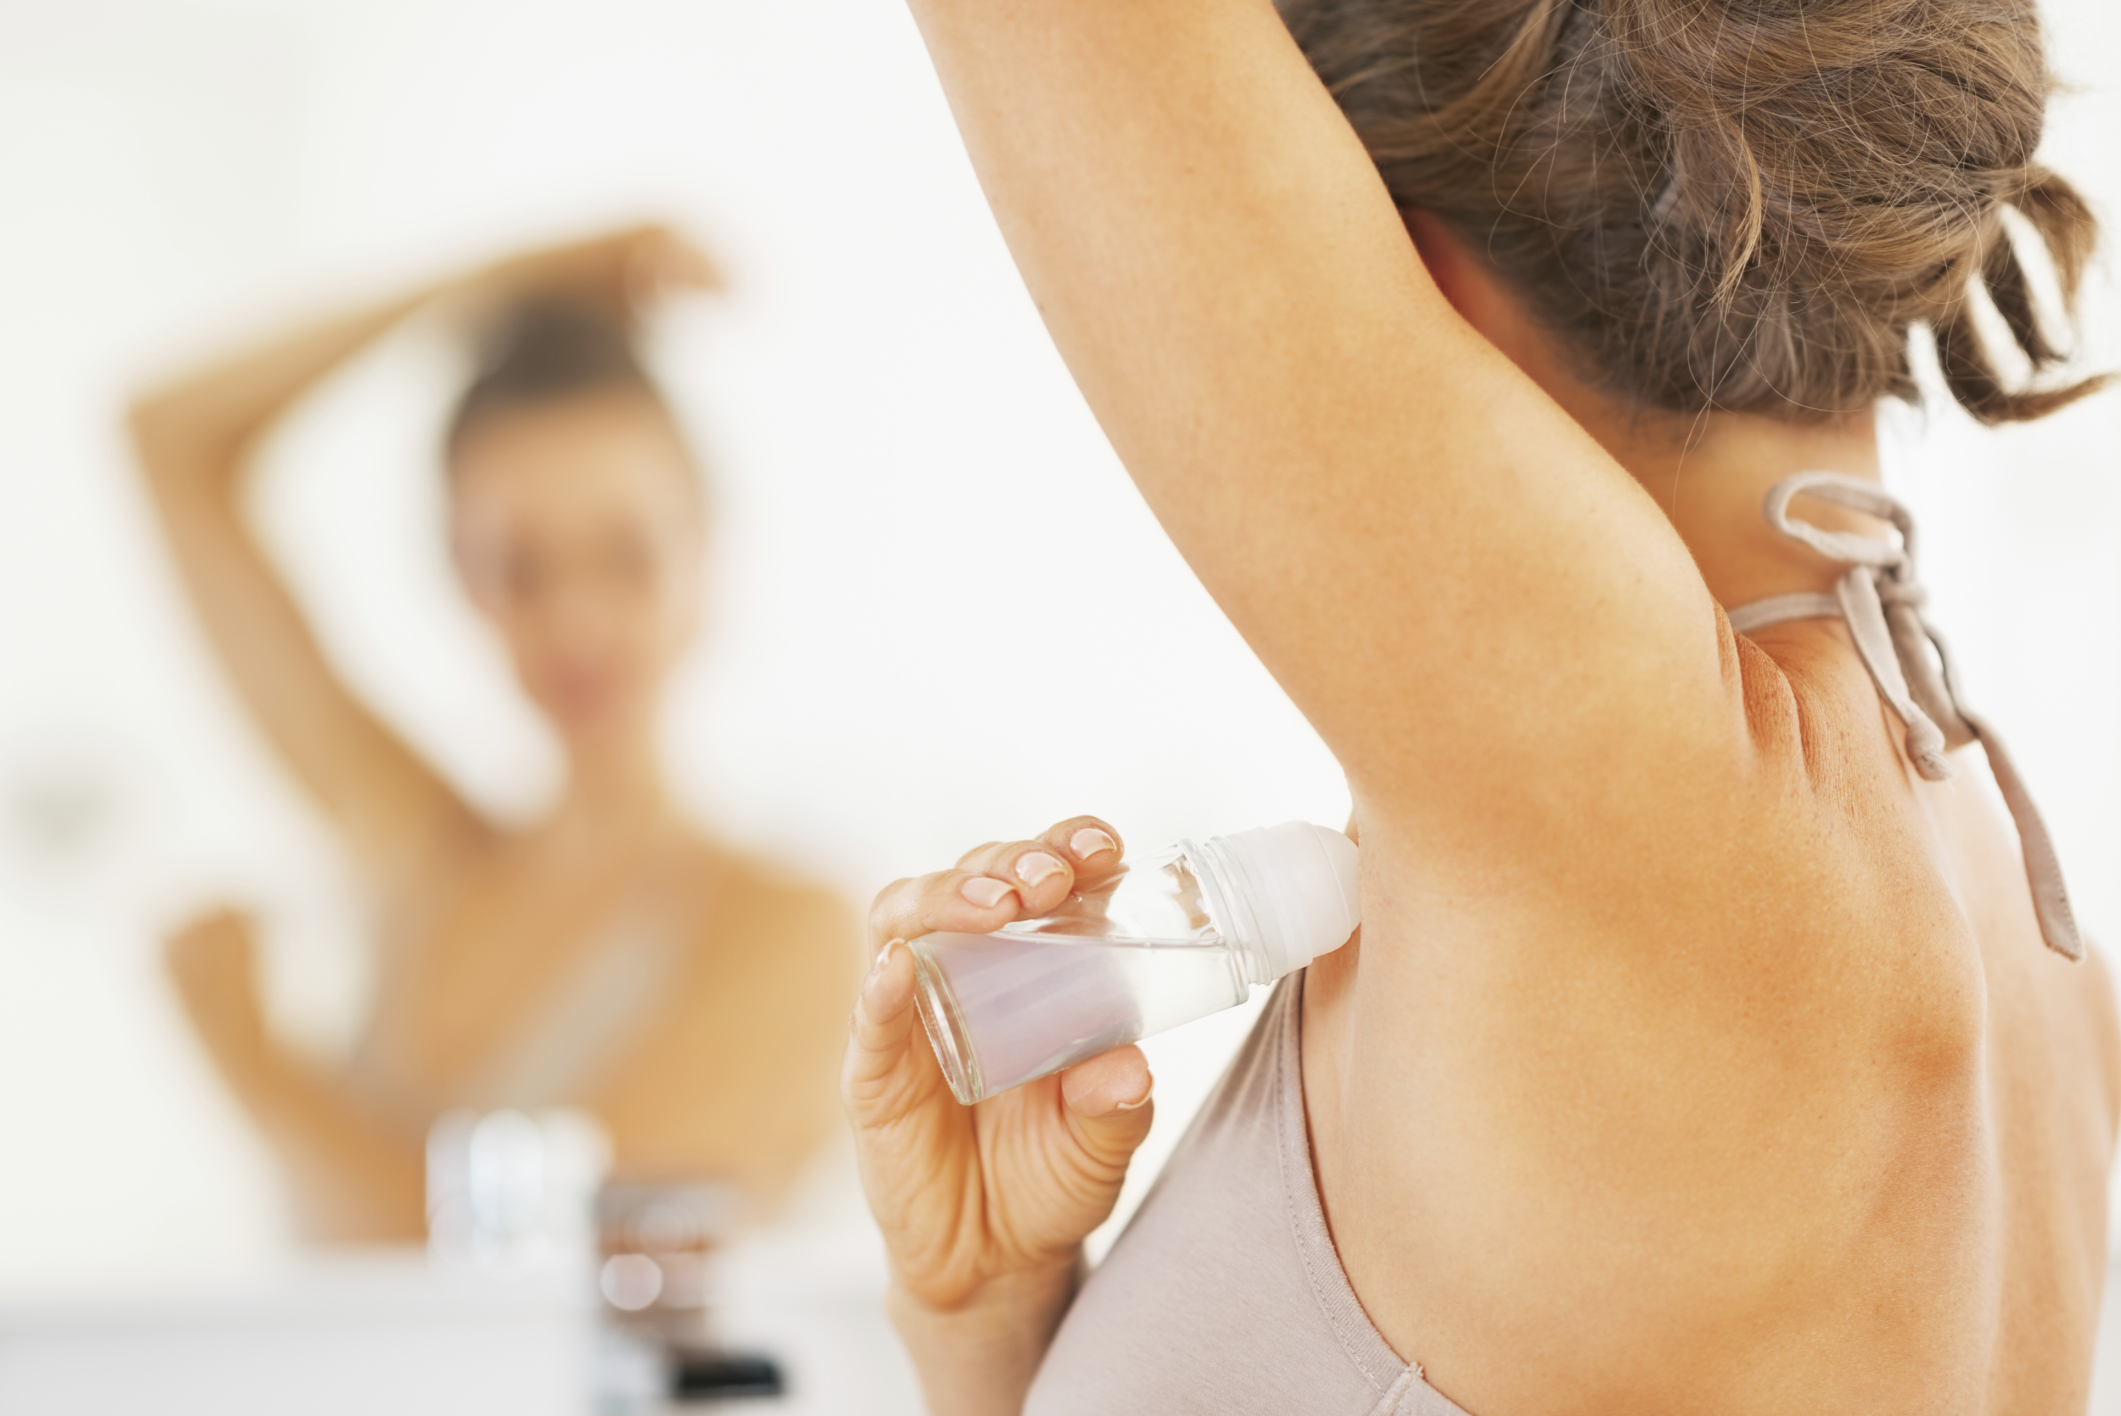 Hormonal Imbalance That Causes Body Odor